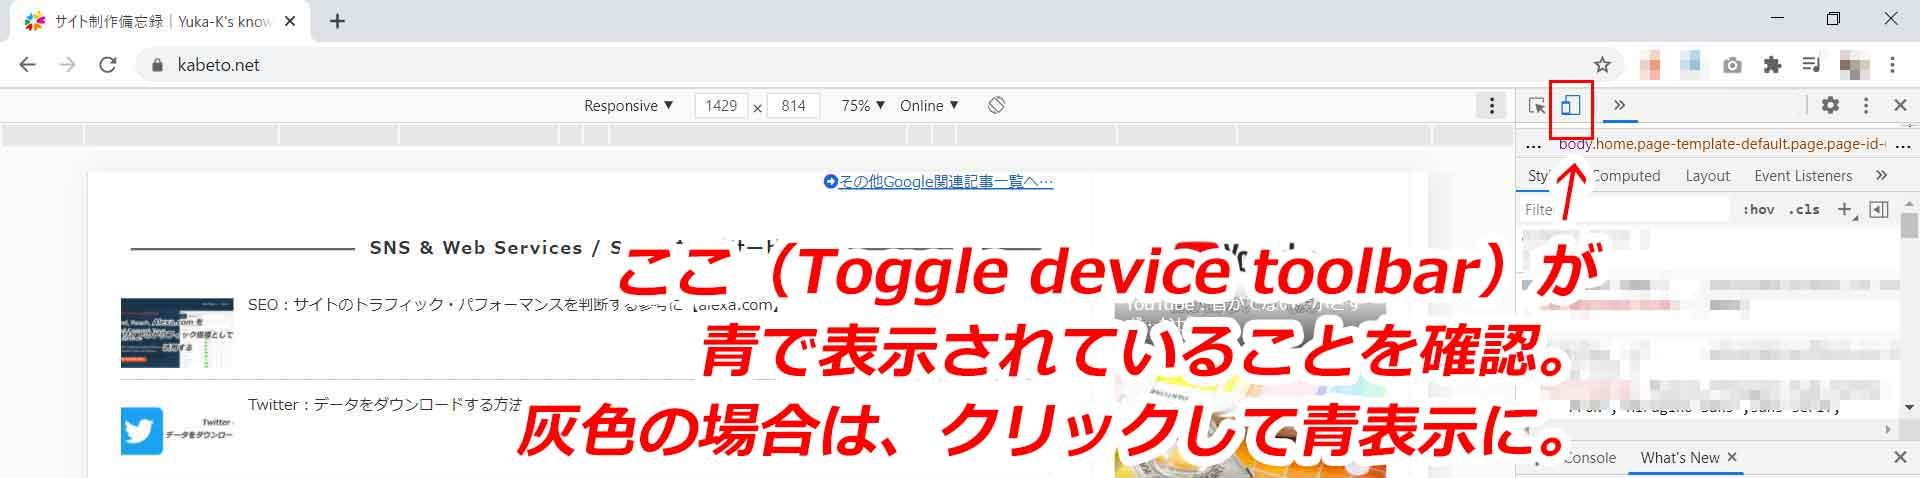 Chromeデベロッパー ツールで全画面スクリーンショットを撮る